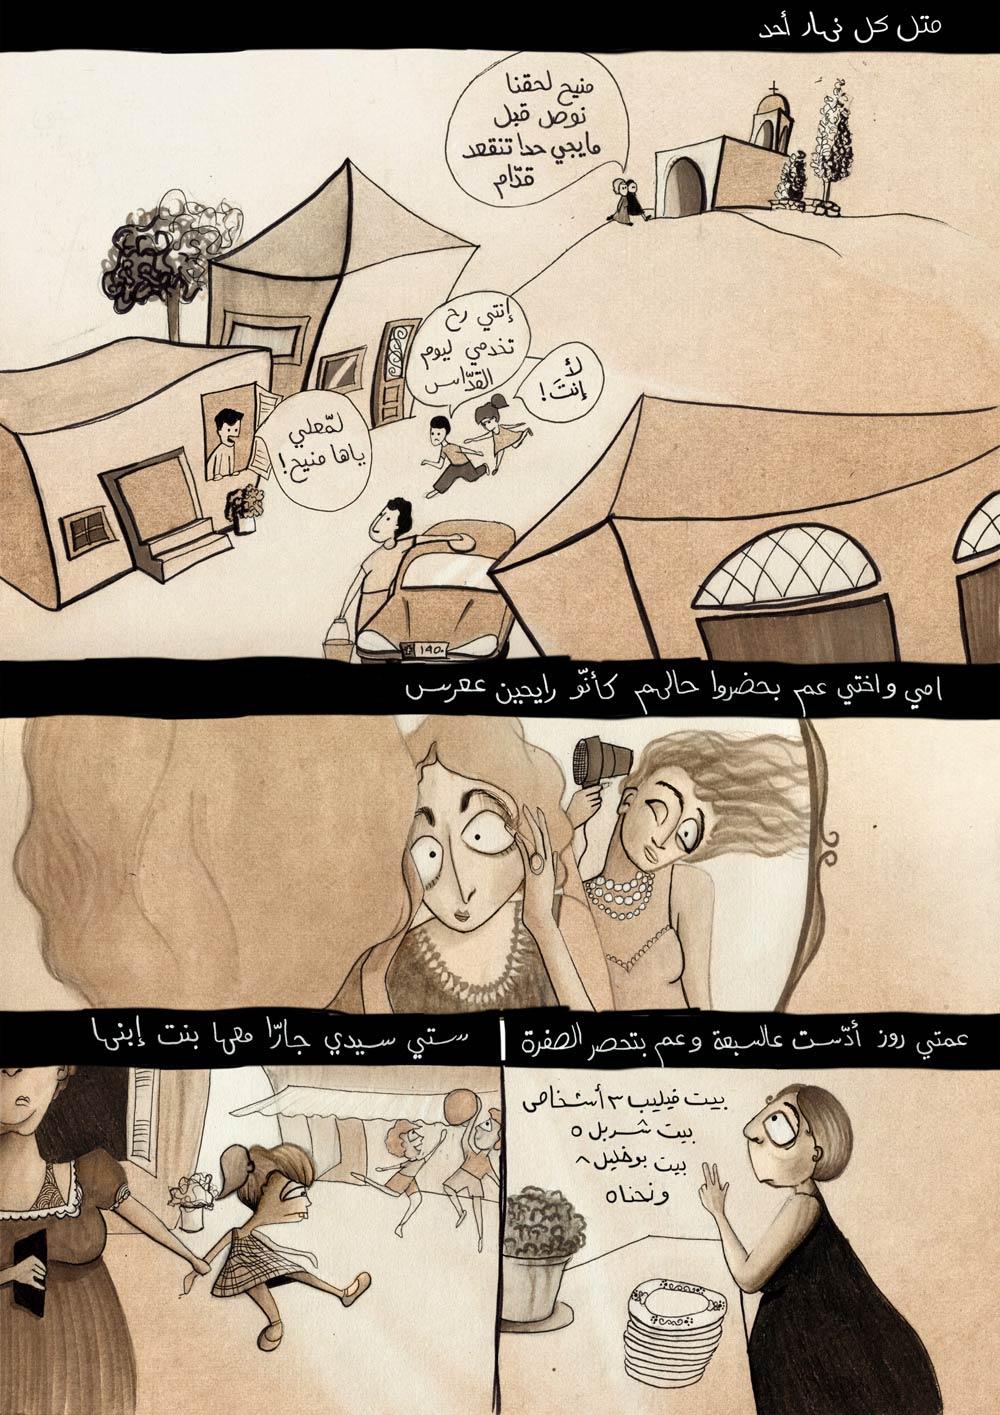 let's comics story